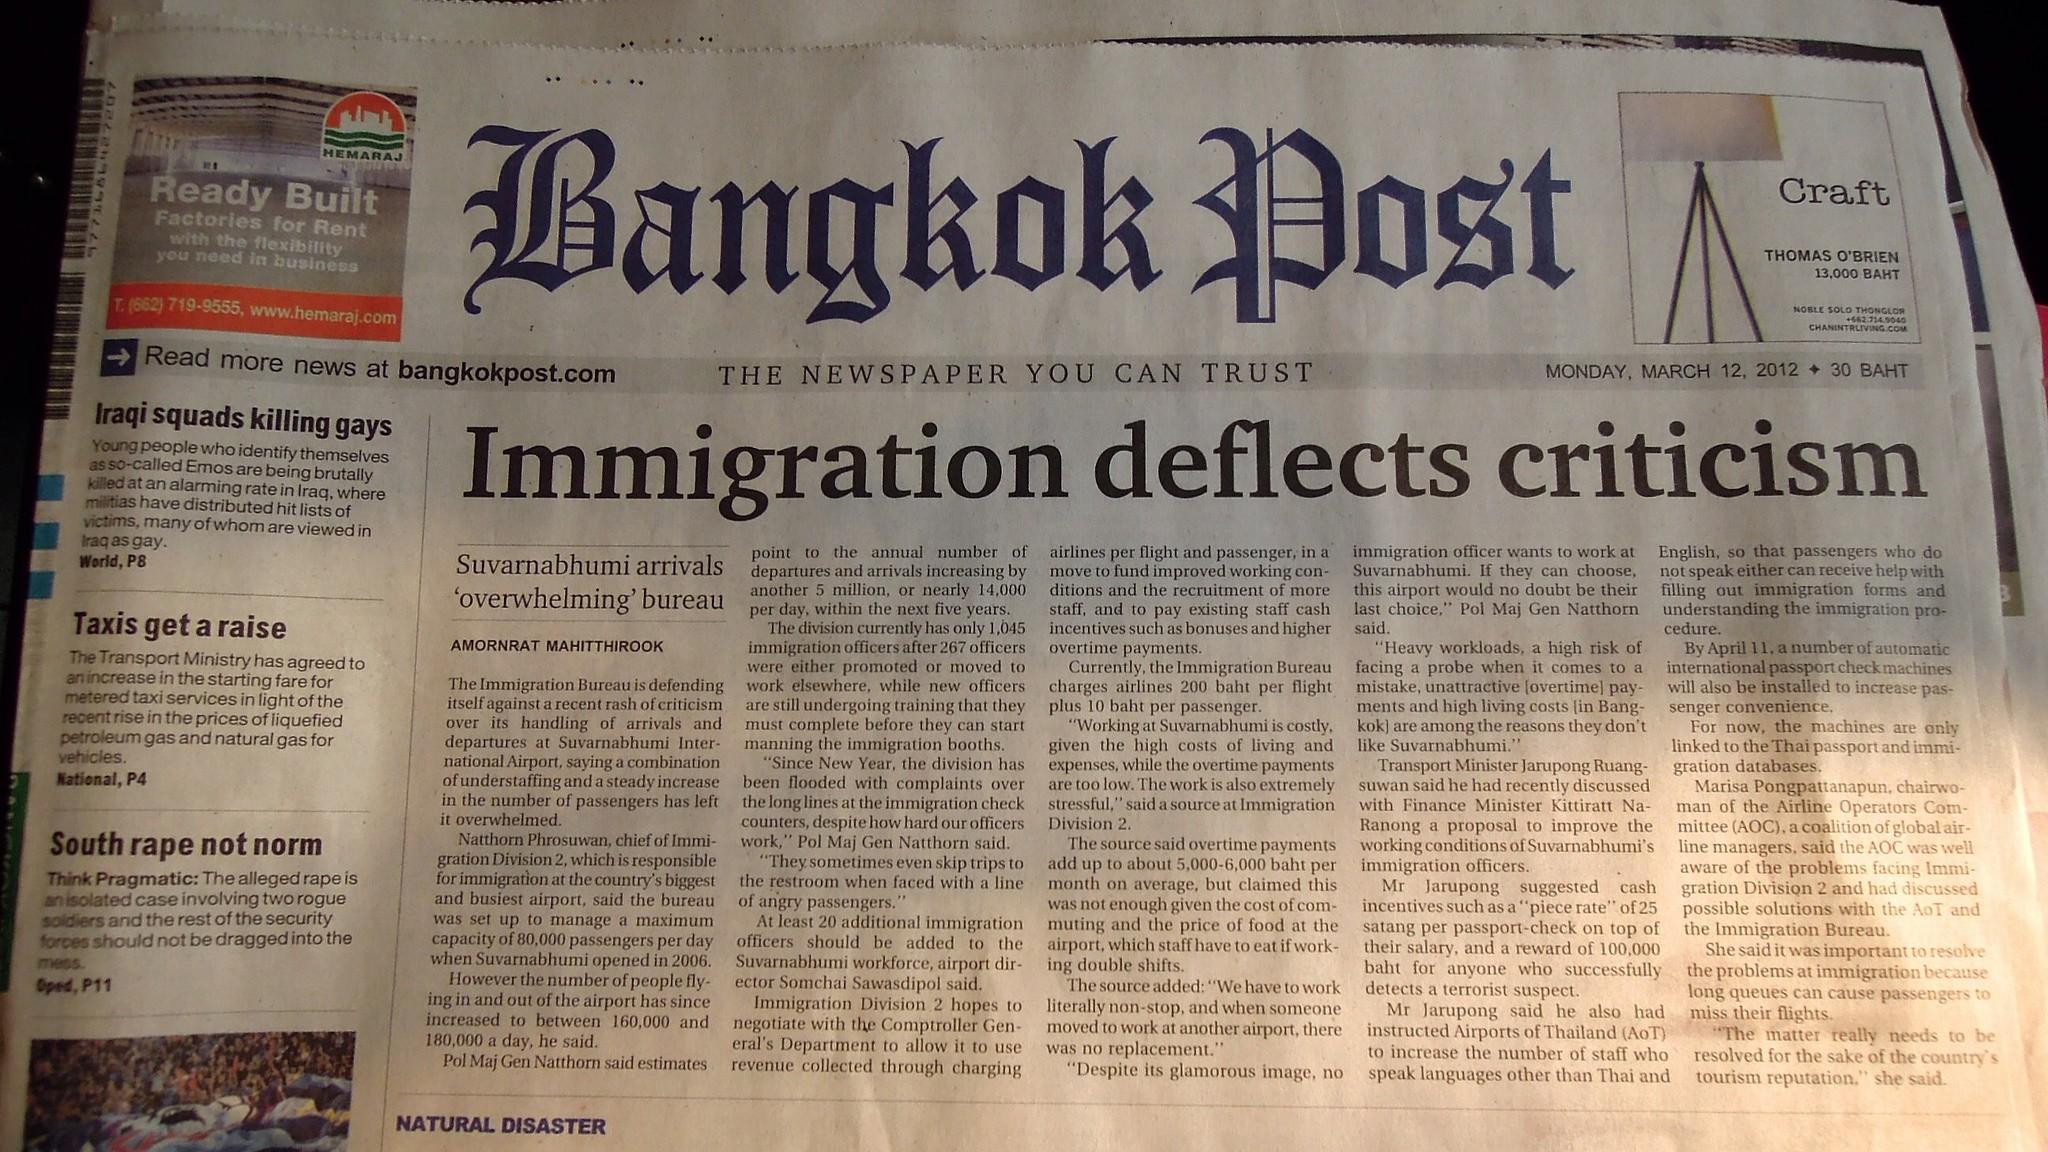 Free dating site bangkok post